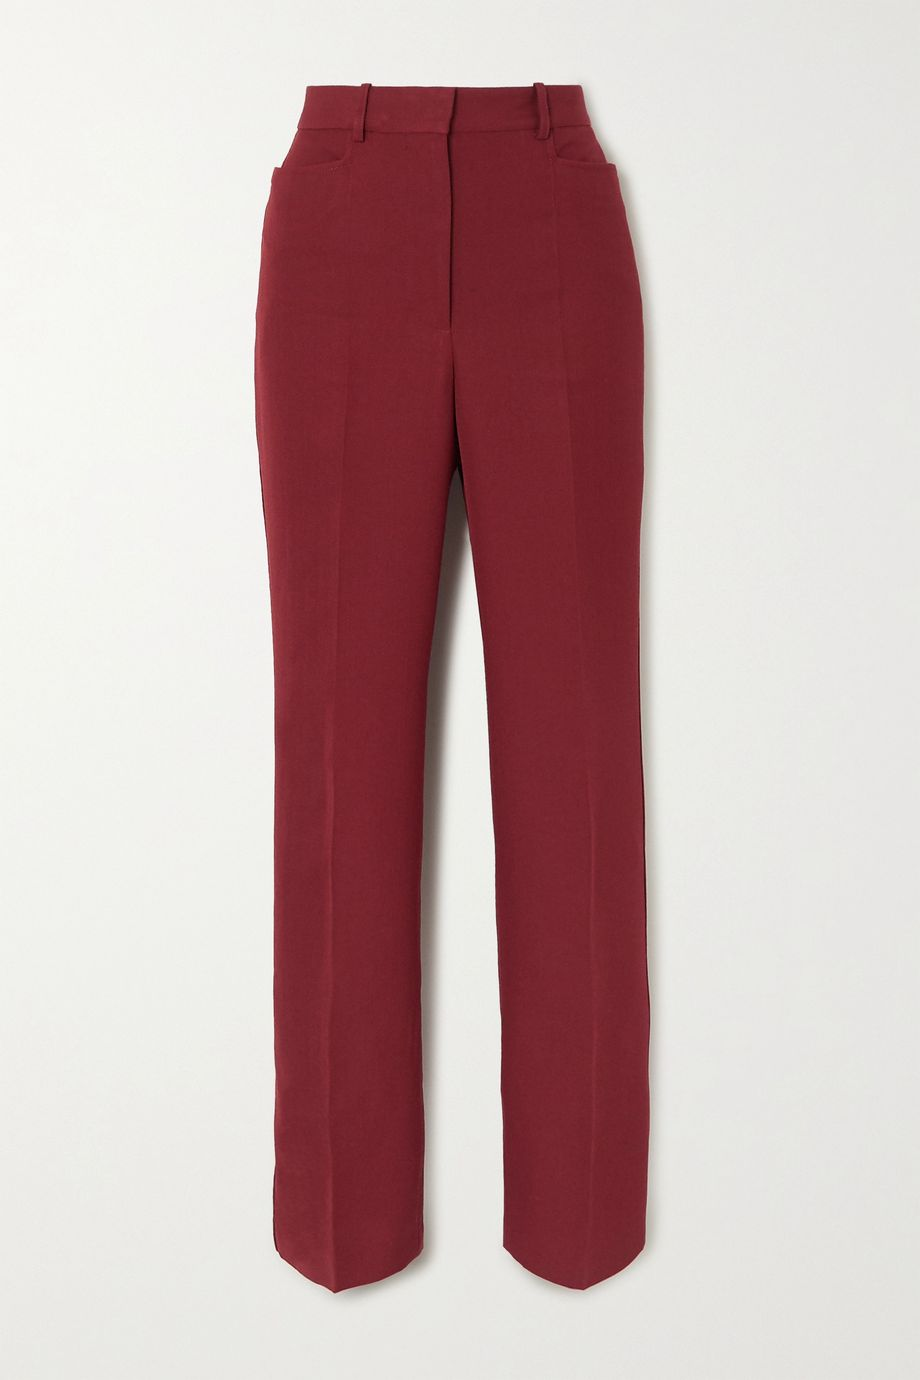 Victoria Beckham Canvas straight-leg pants